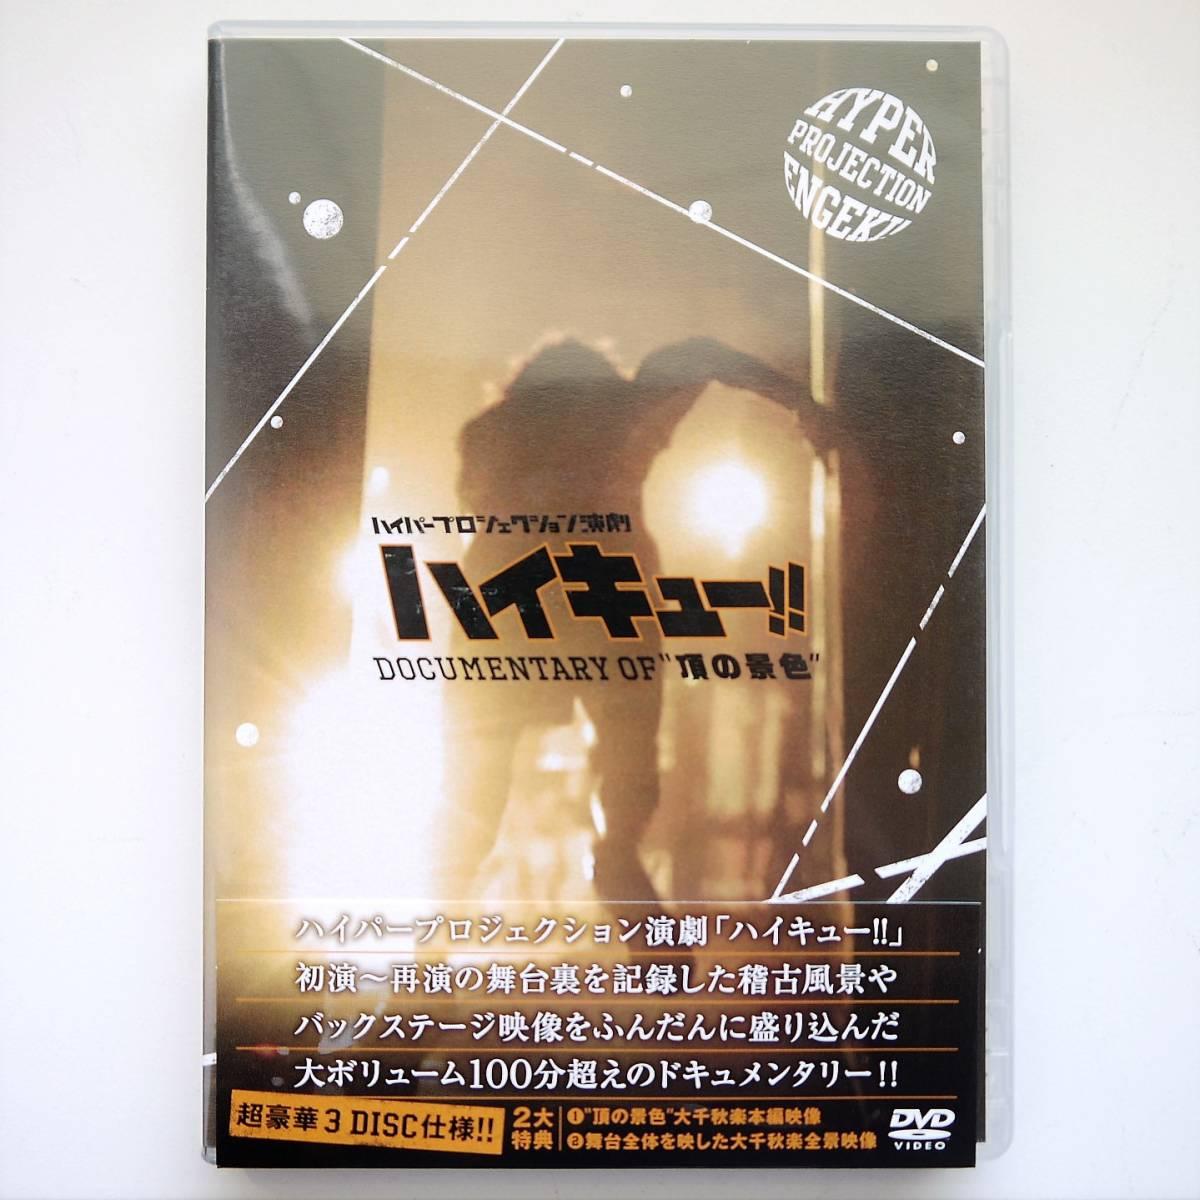 DVD 舞台 ハイパープロジェクション演劇 ハイキュー!! Documentary of 頂の景色